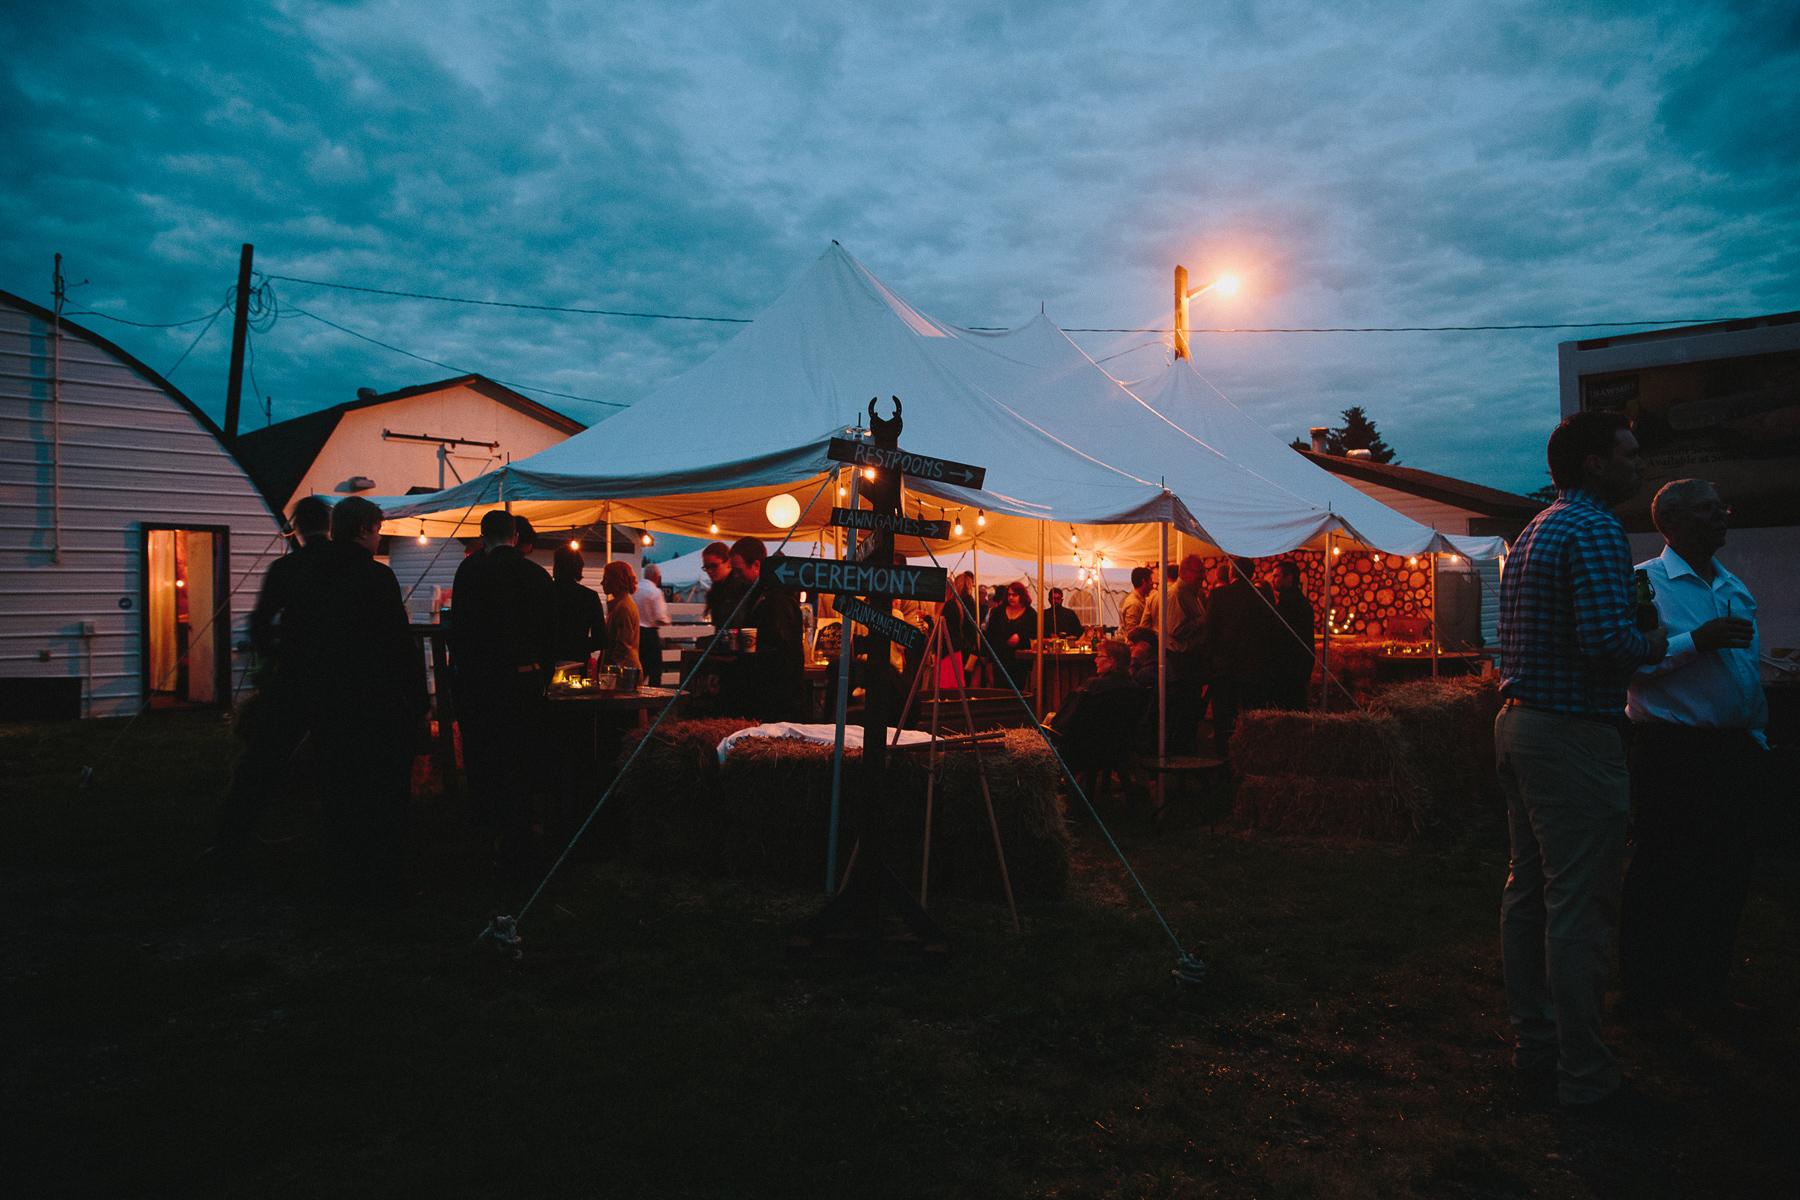 alberta-farm-wedding-photographer-rp-wj-248.jpg